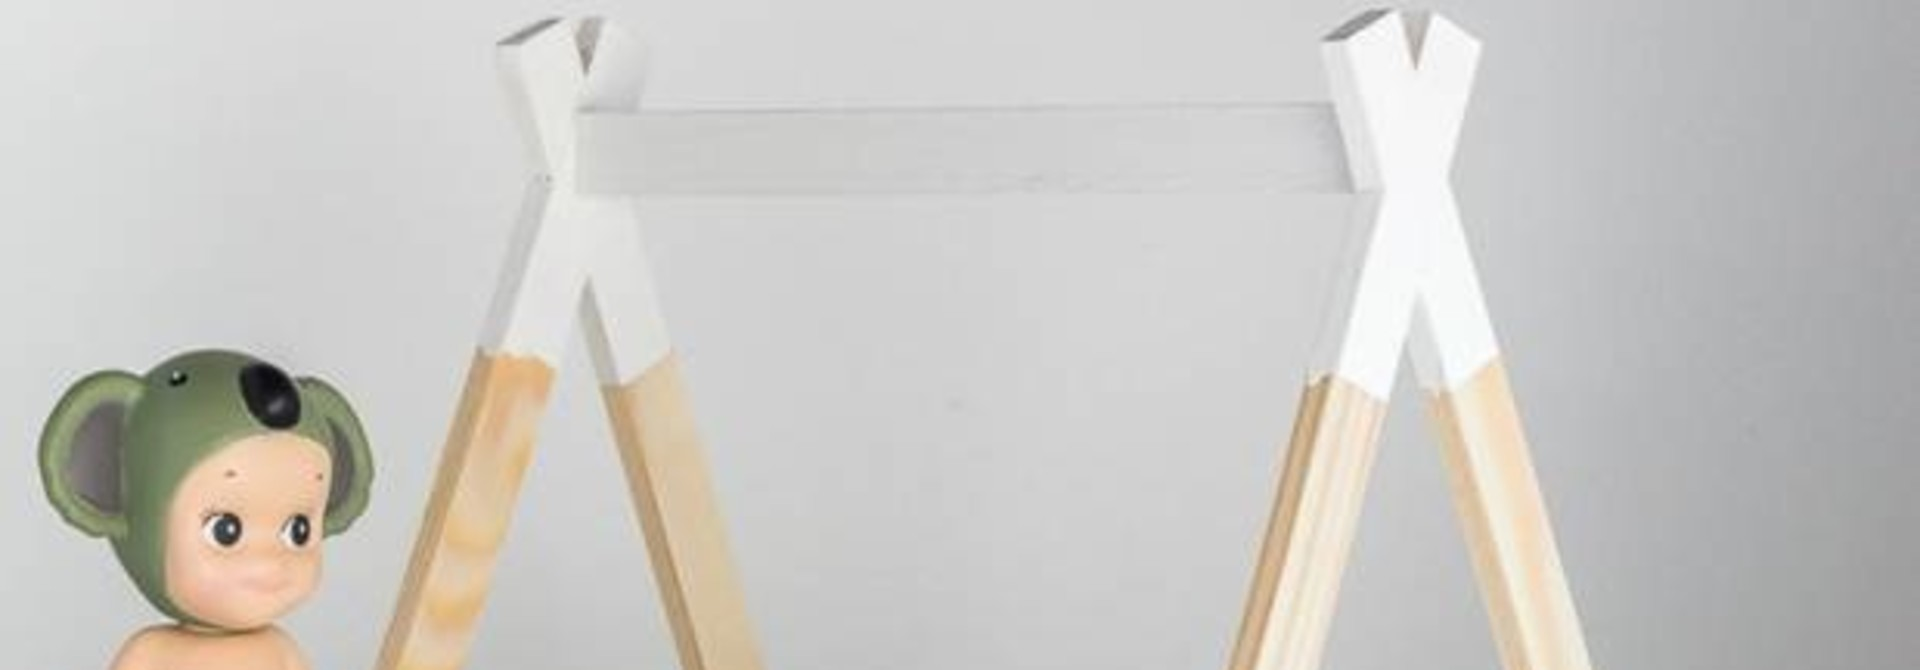 Tipi Bed Open Model Wit